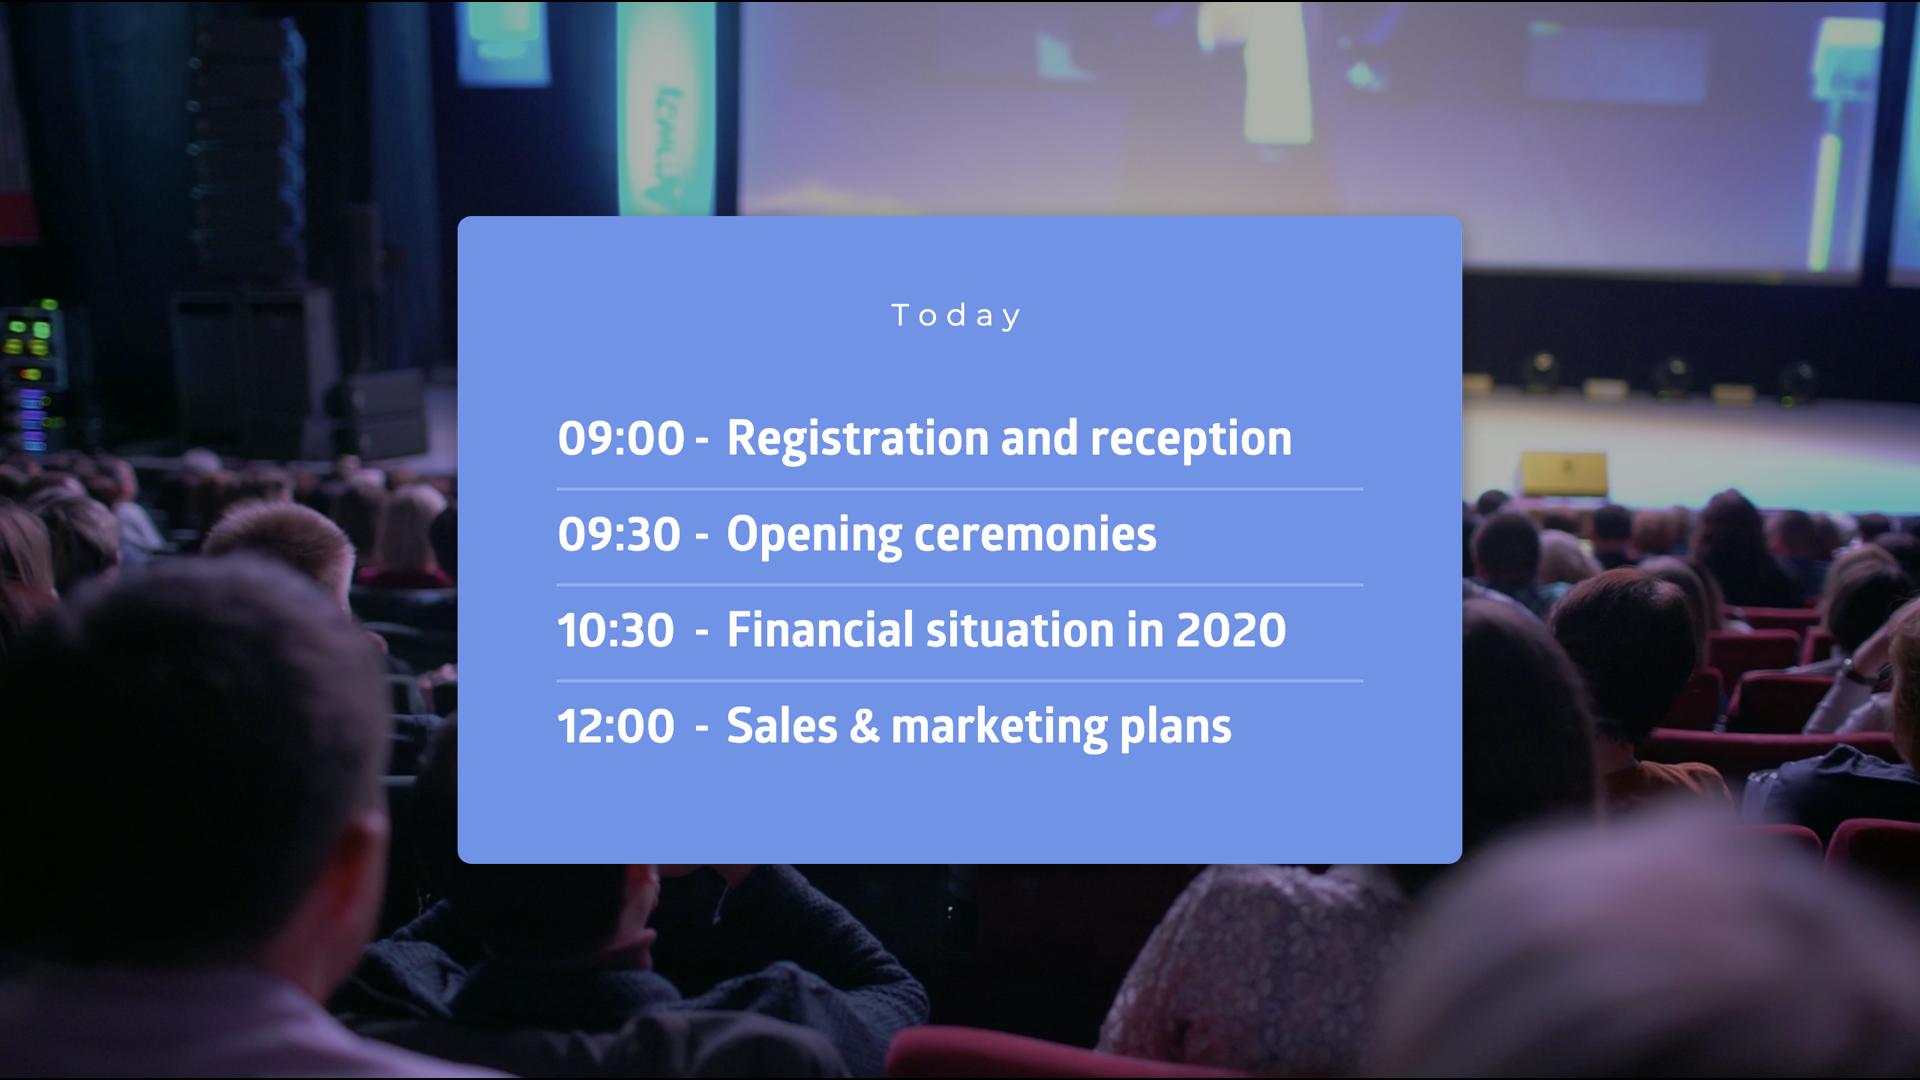 Present event agenda